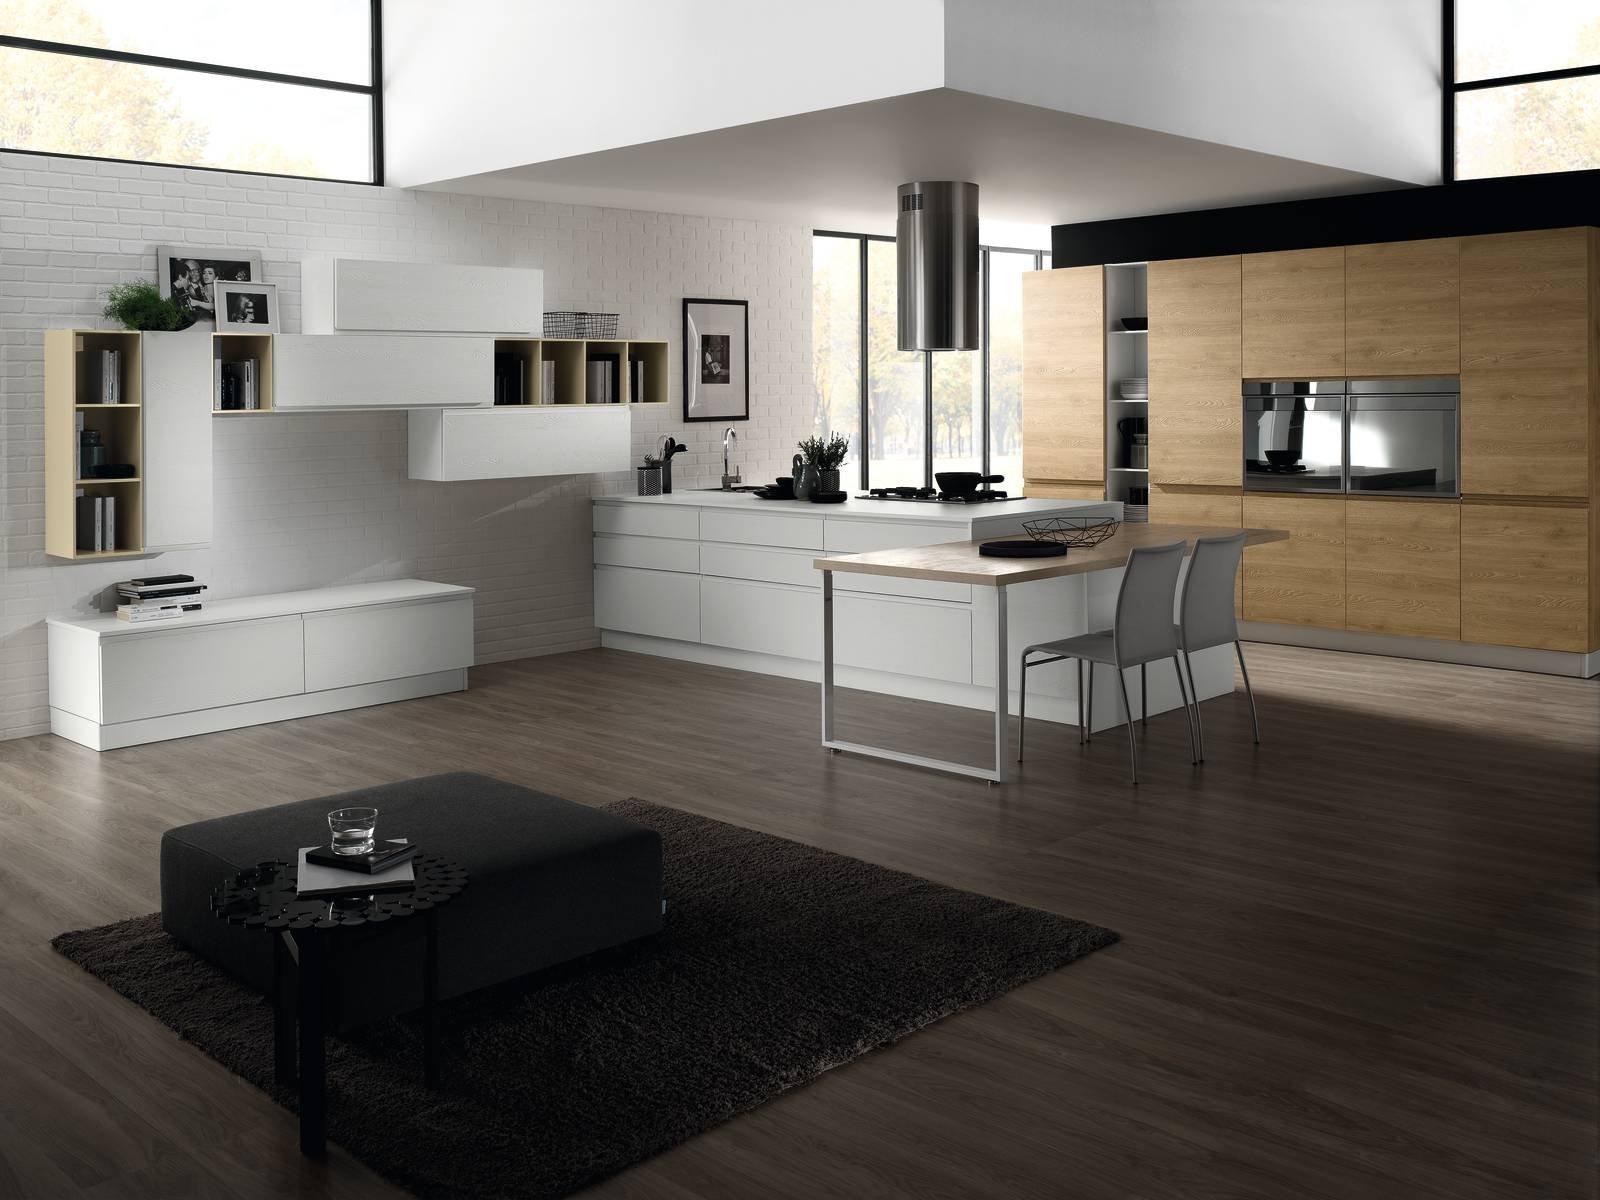 Dimensioni cucina con isola beautiful cucina con isola dimensioni progetto cucina con isola - Altezza isola cucina ...